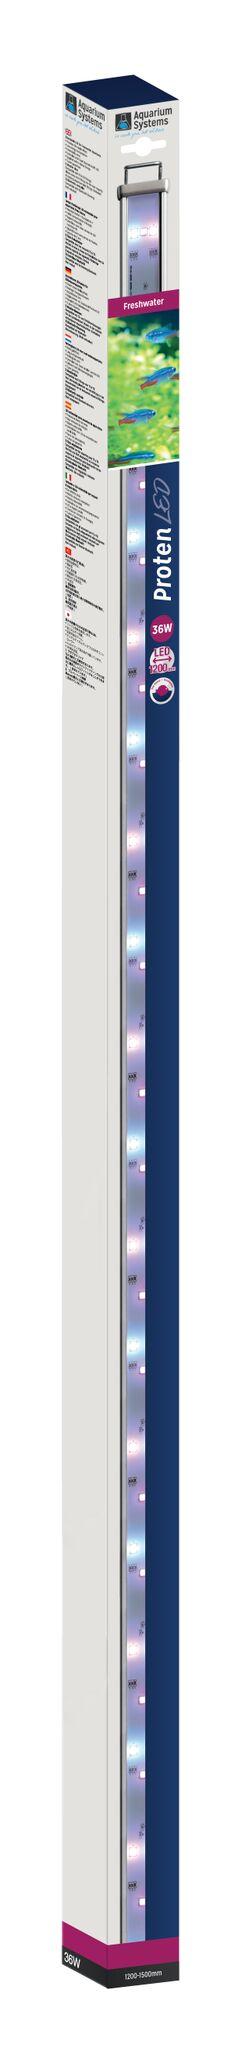 Aquarium Systems Proten LED bar  36 Watt